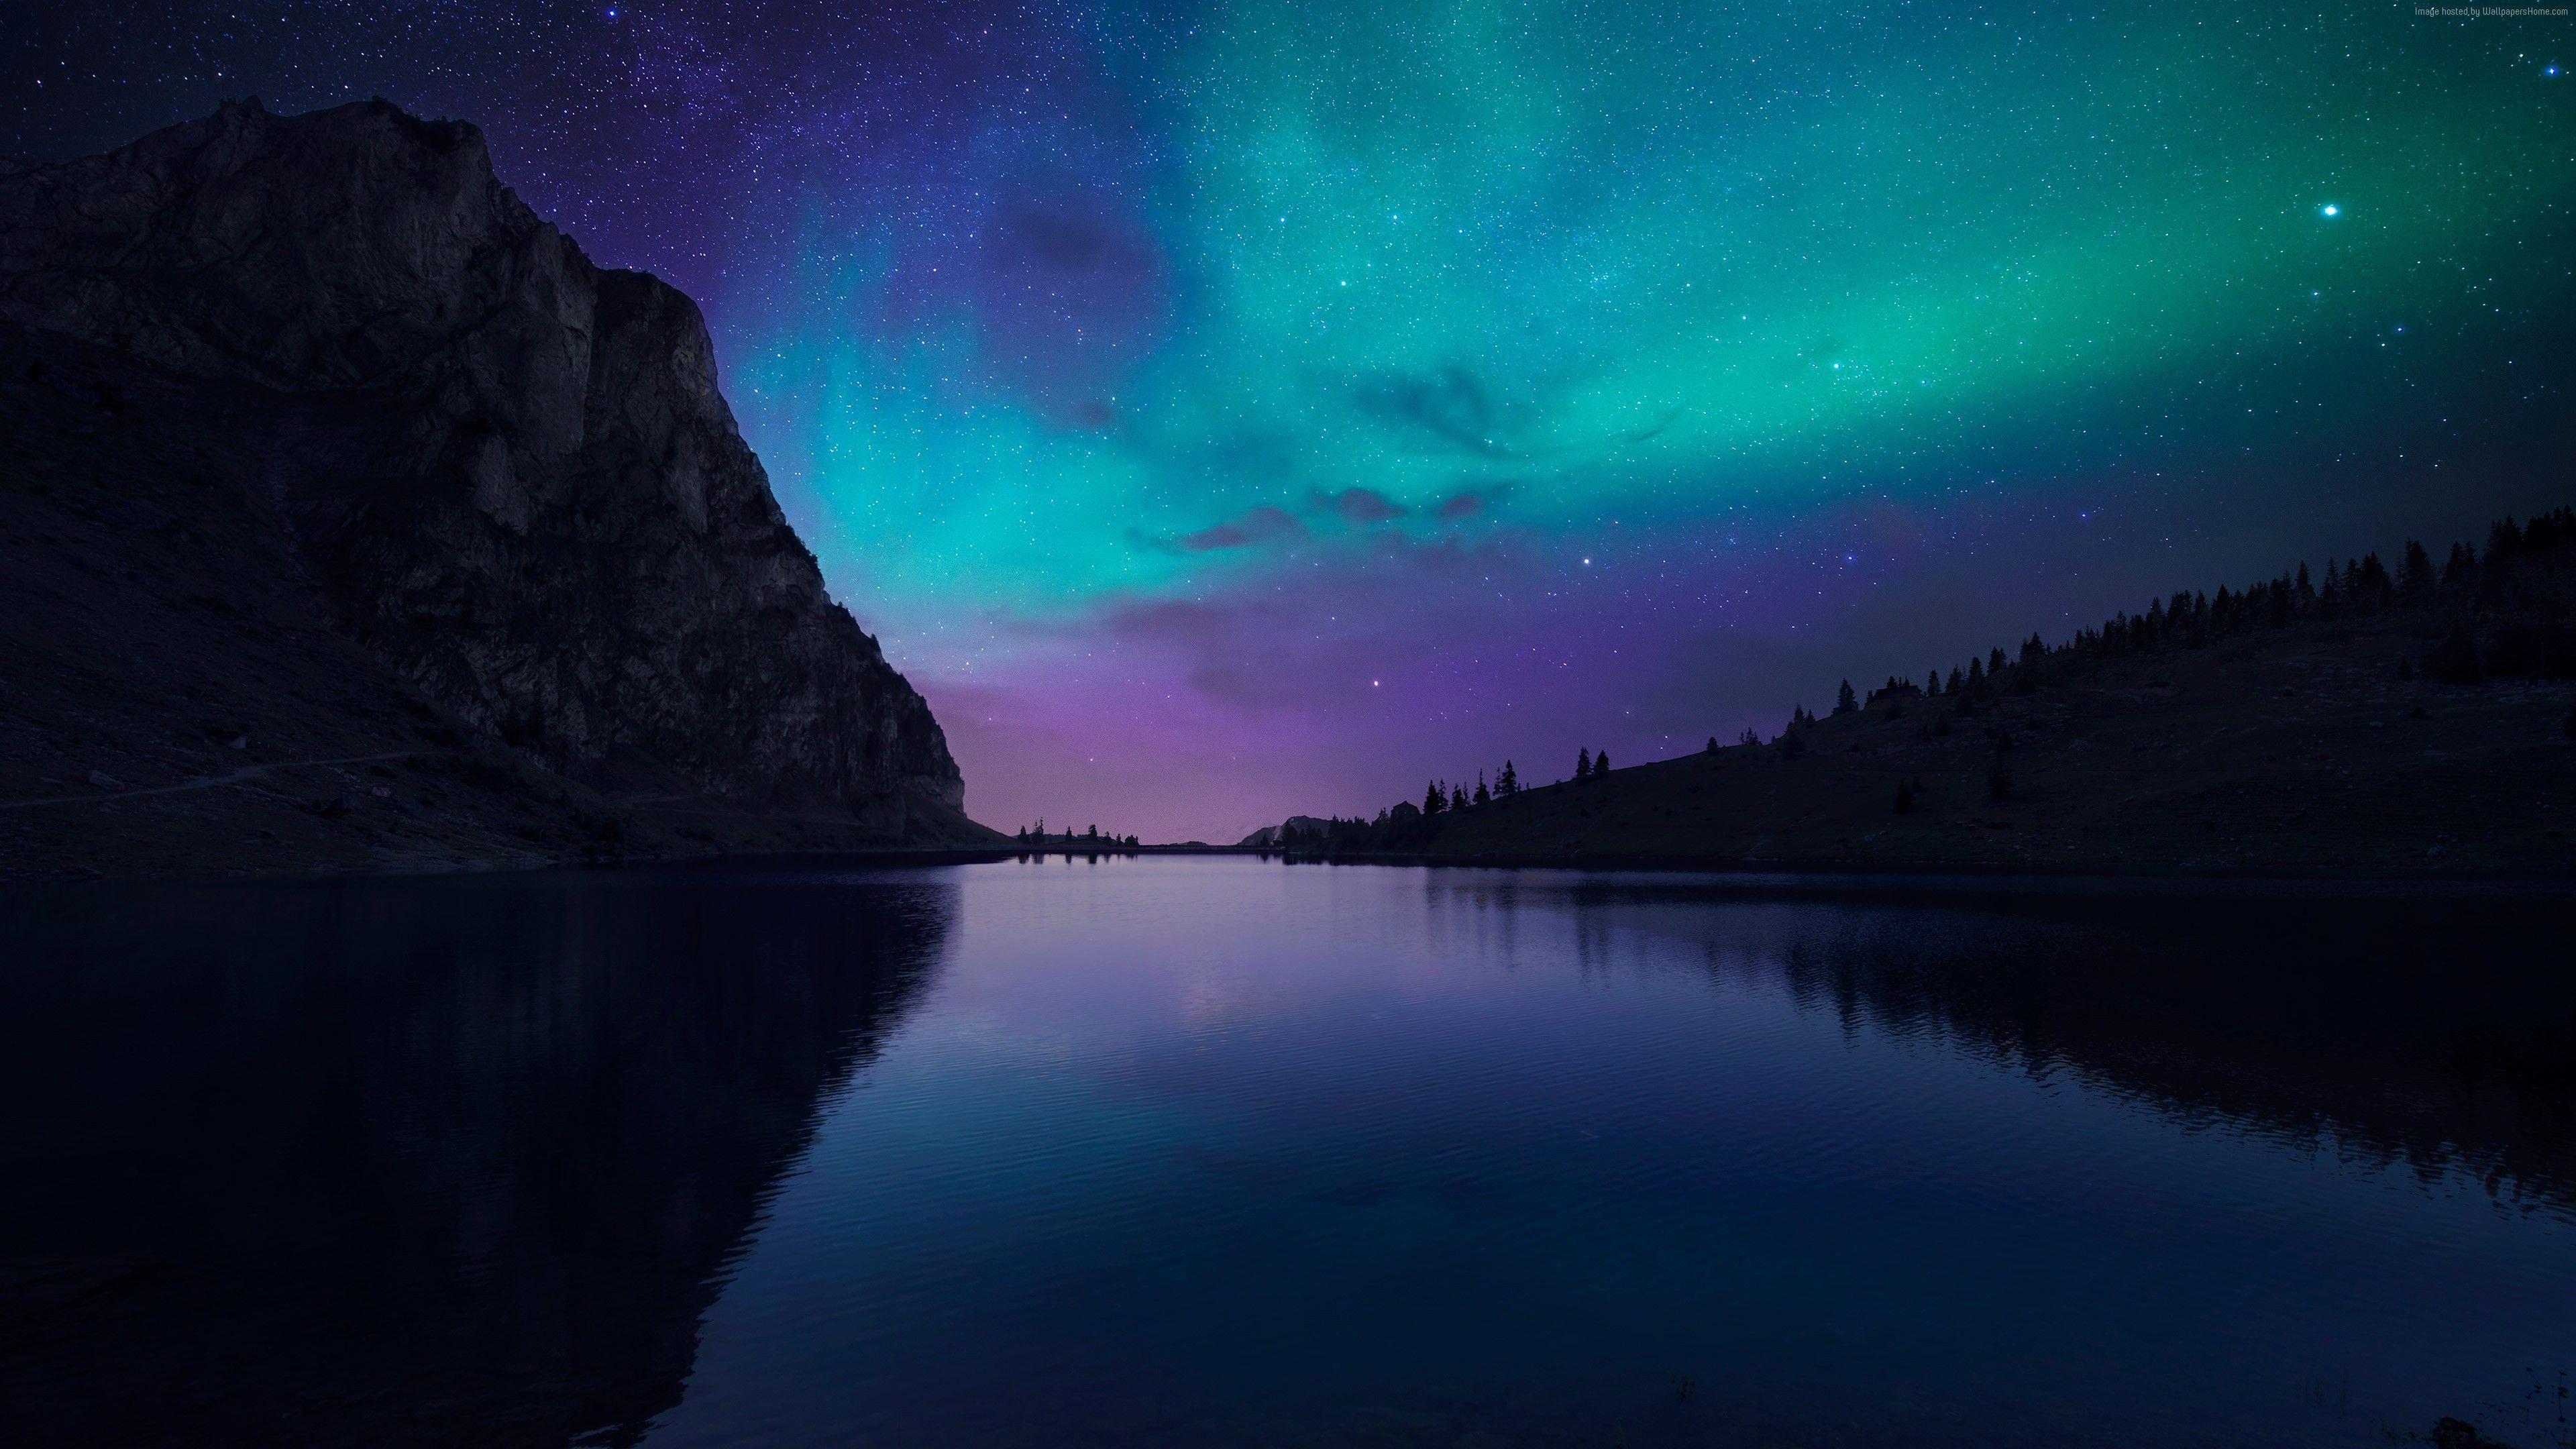 Lake Aurora 4K Wallpaper and Desktop Images 4k animals 4k ...